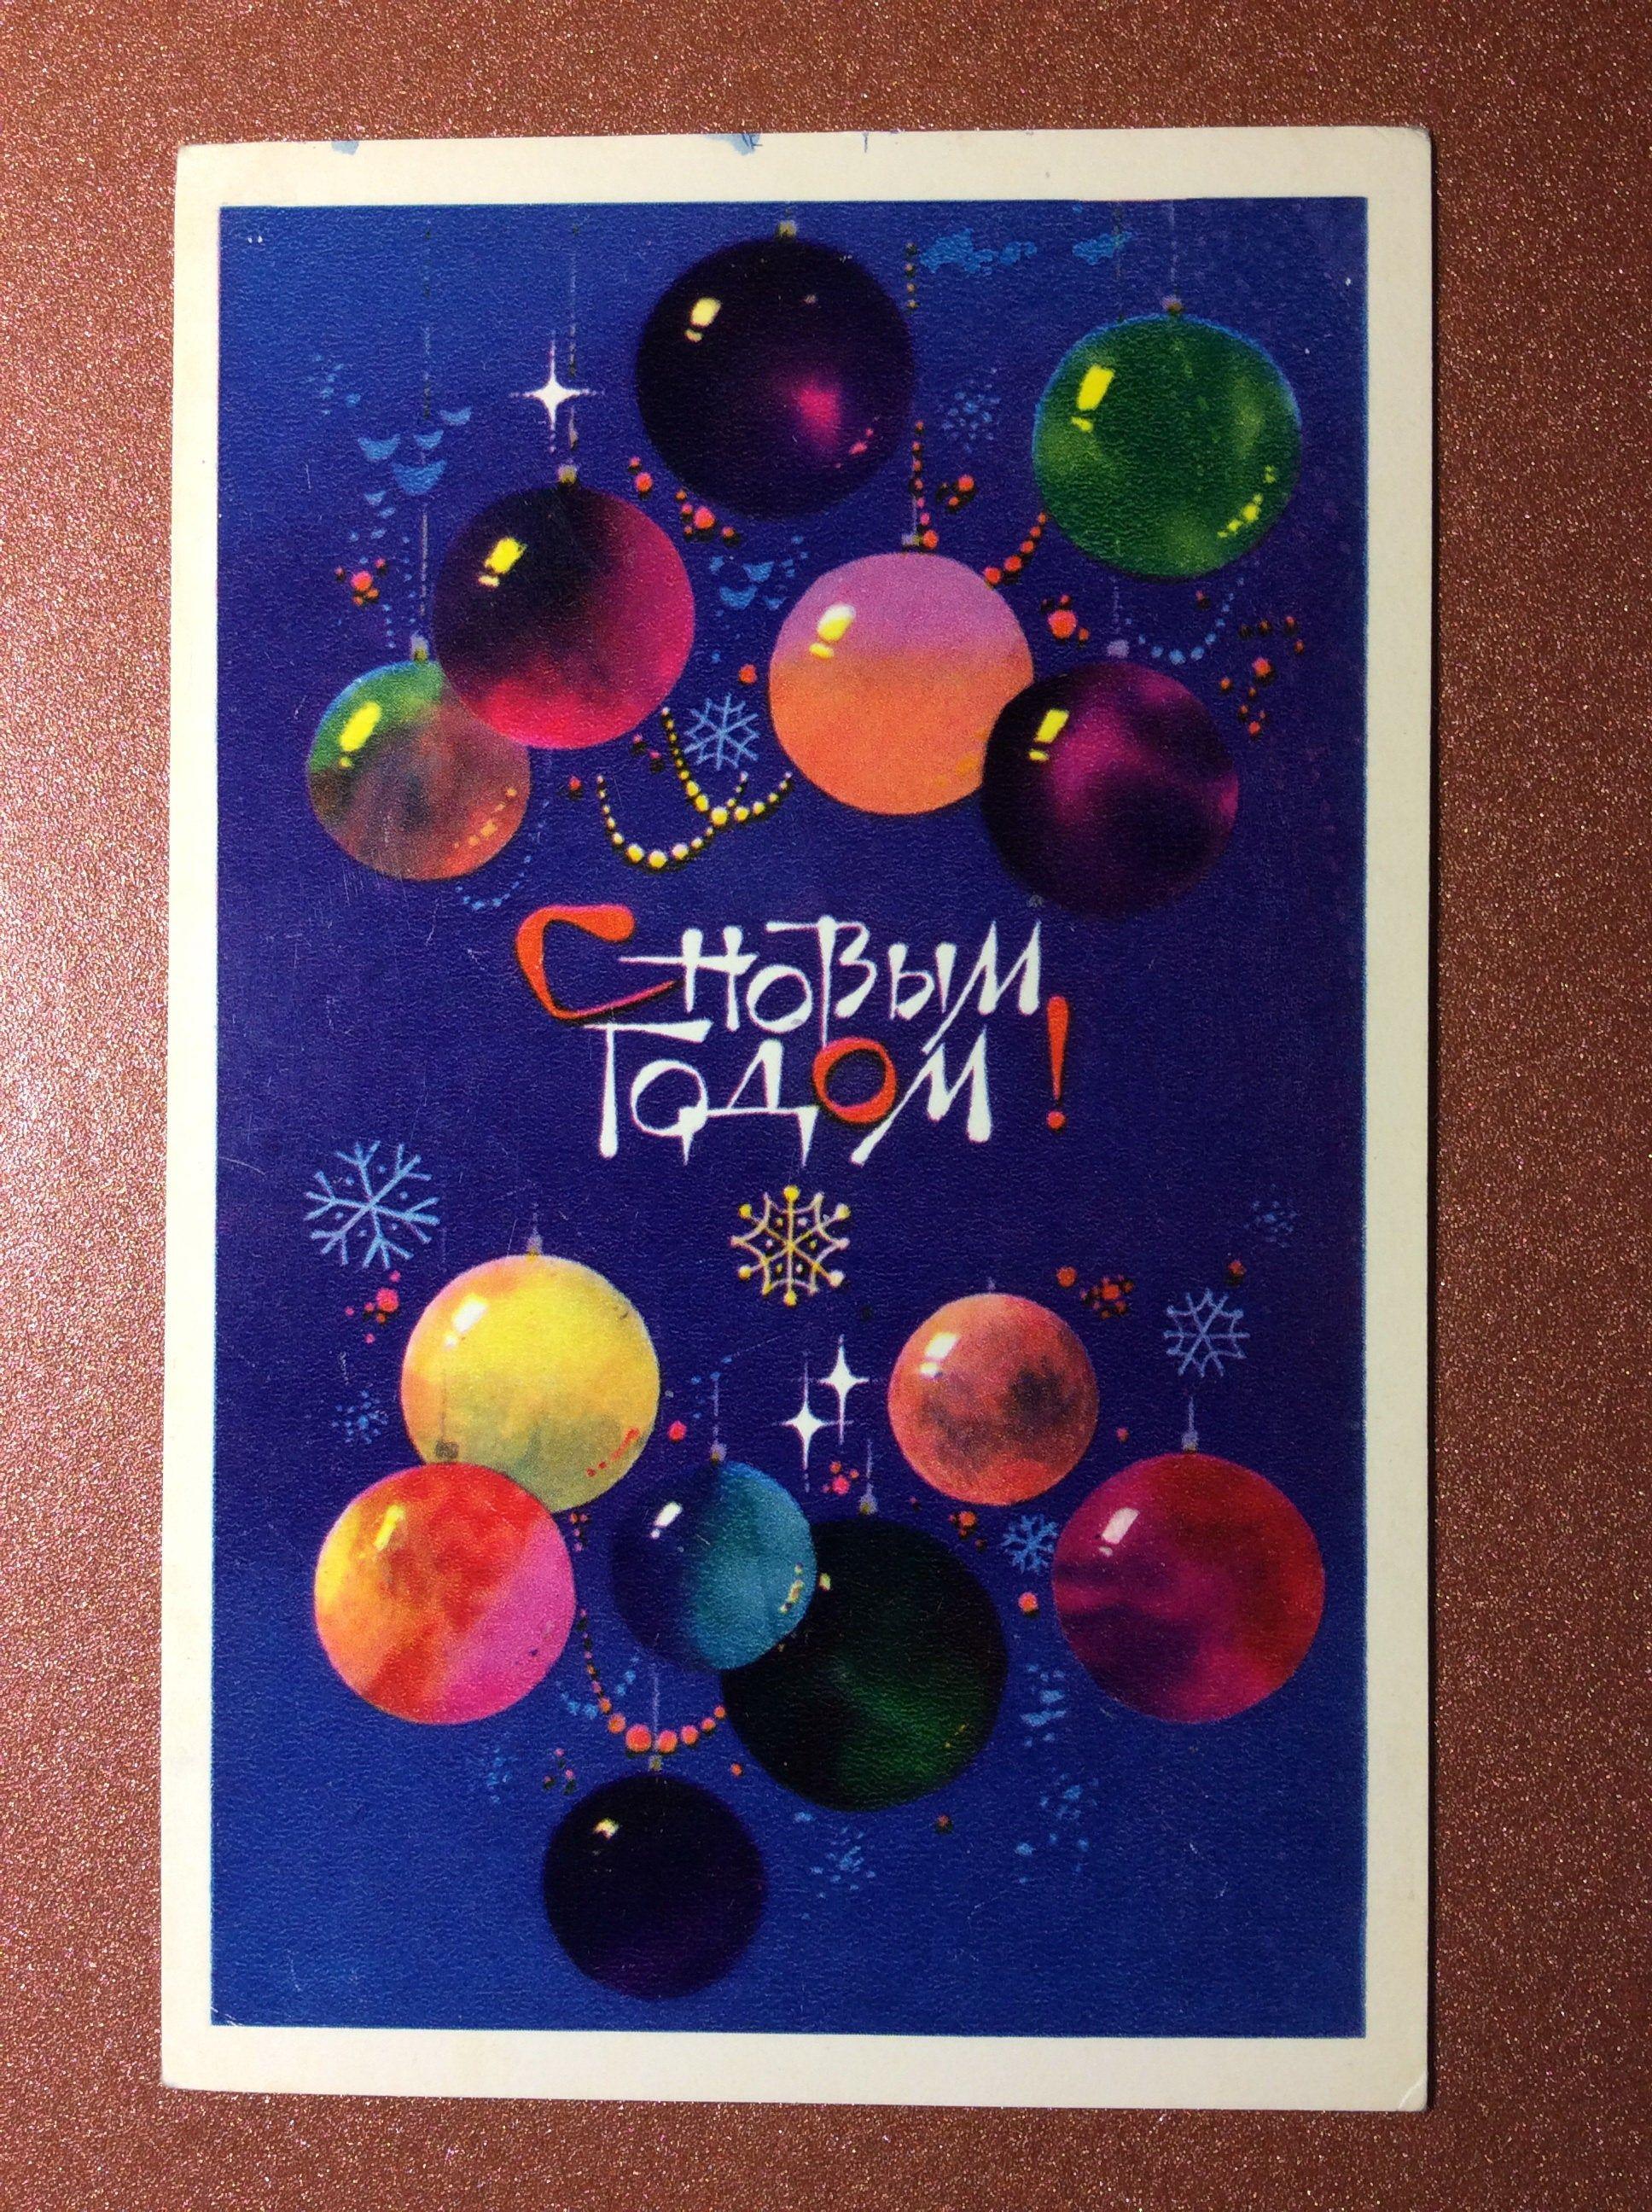 Vintage Russian Ussr Newyear Unused Postcard 1973 By Mahov Russian Newyear S Decor Christmas Toys Balls Mag Postcard Christmas Toys Garland